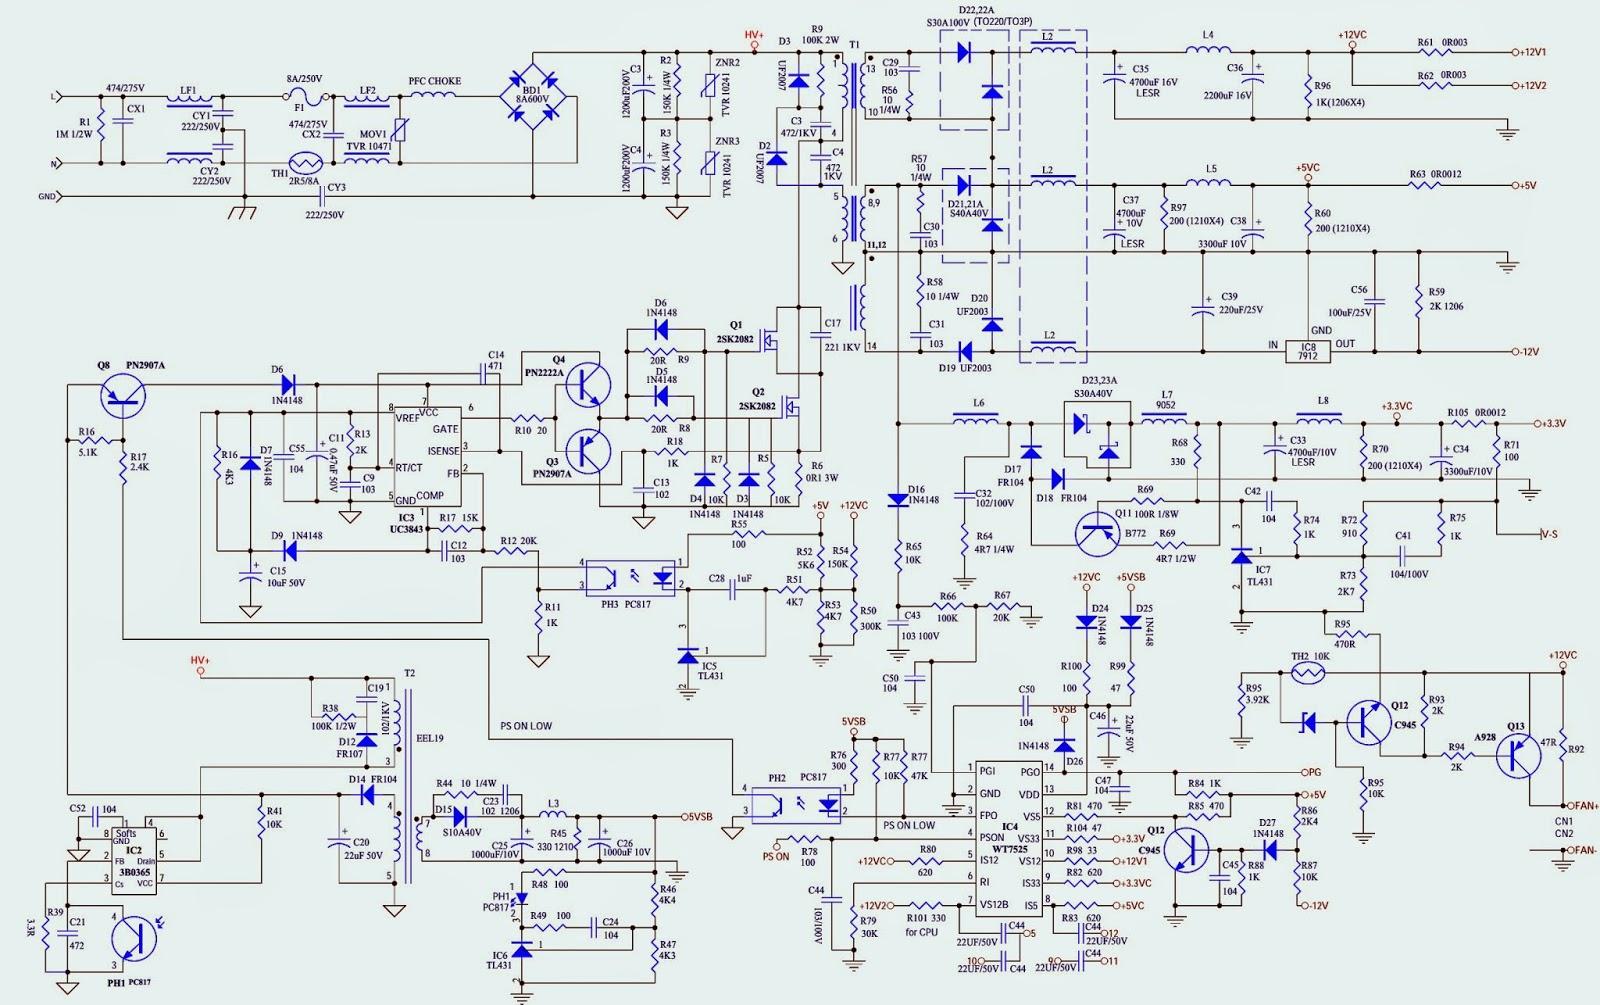 atx power supply schematic diagram led power supply schematic